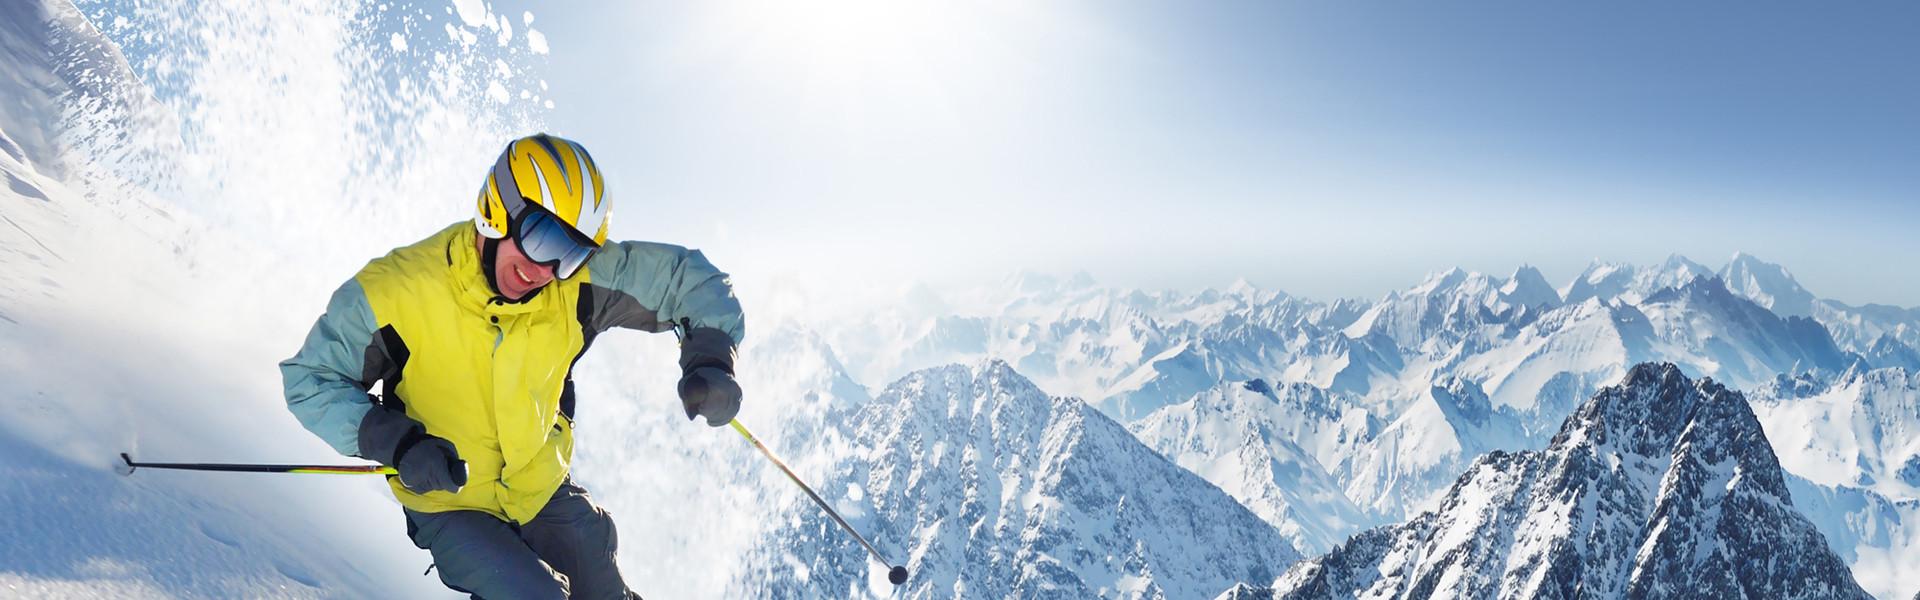 Snow Skiing at our Park City, Utah Hotel and Ski Resort | Skiing Down White-Powder Slope